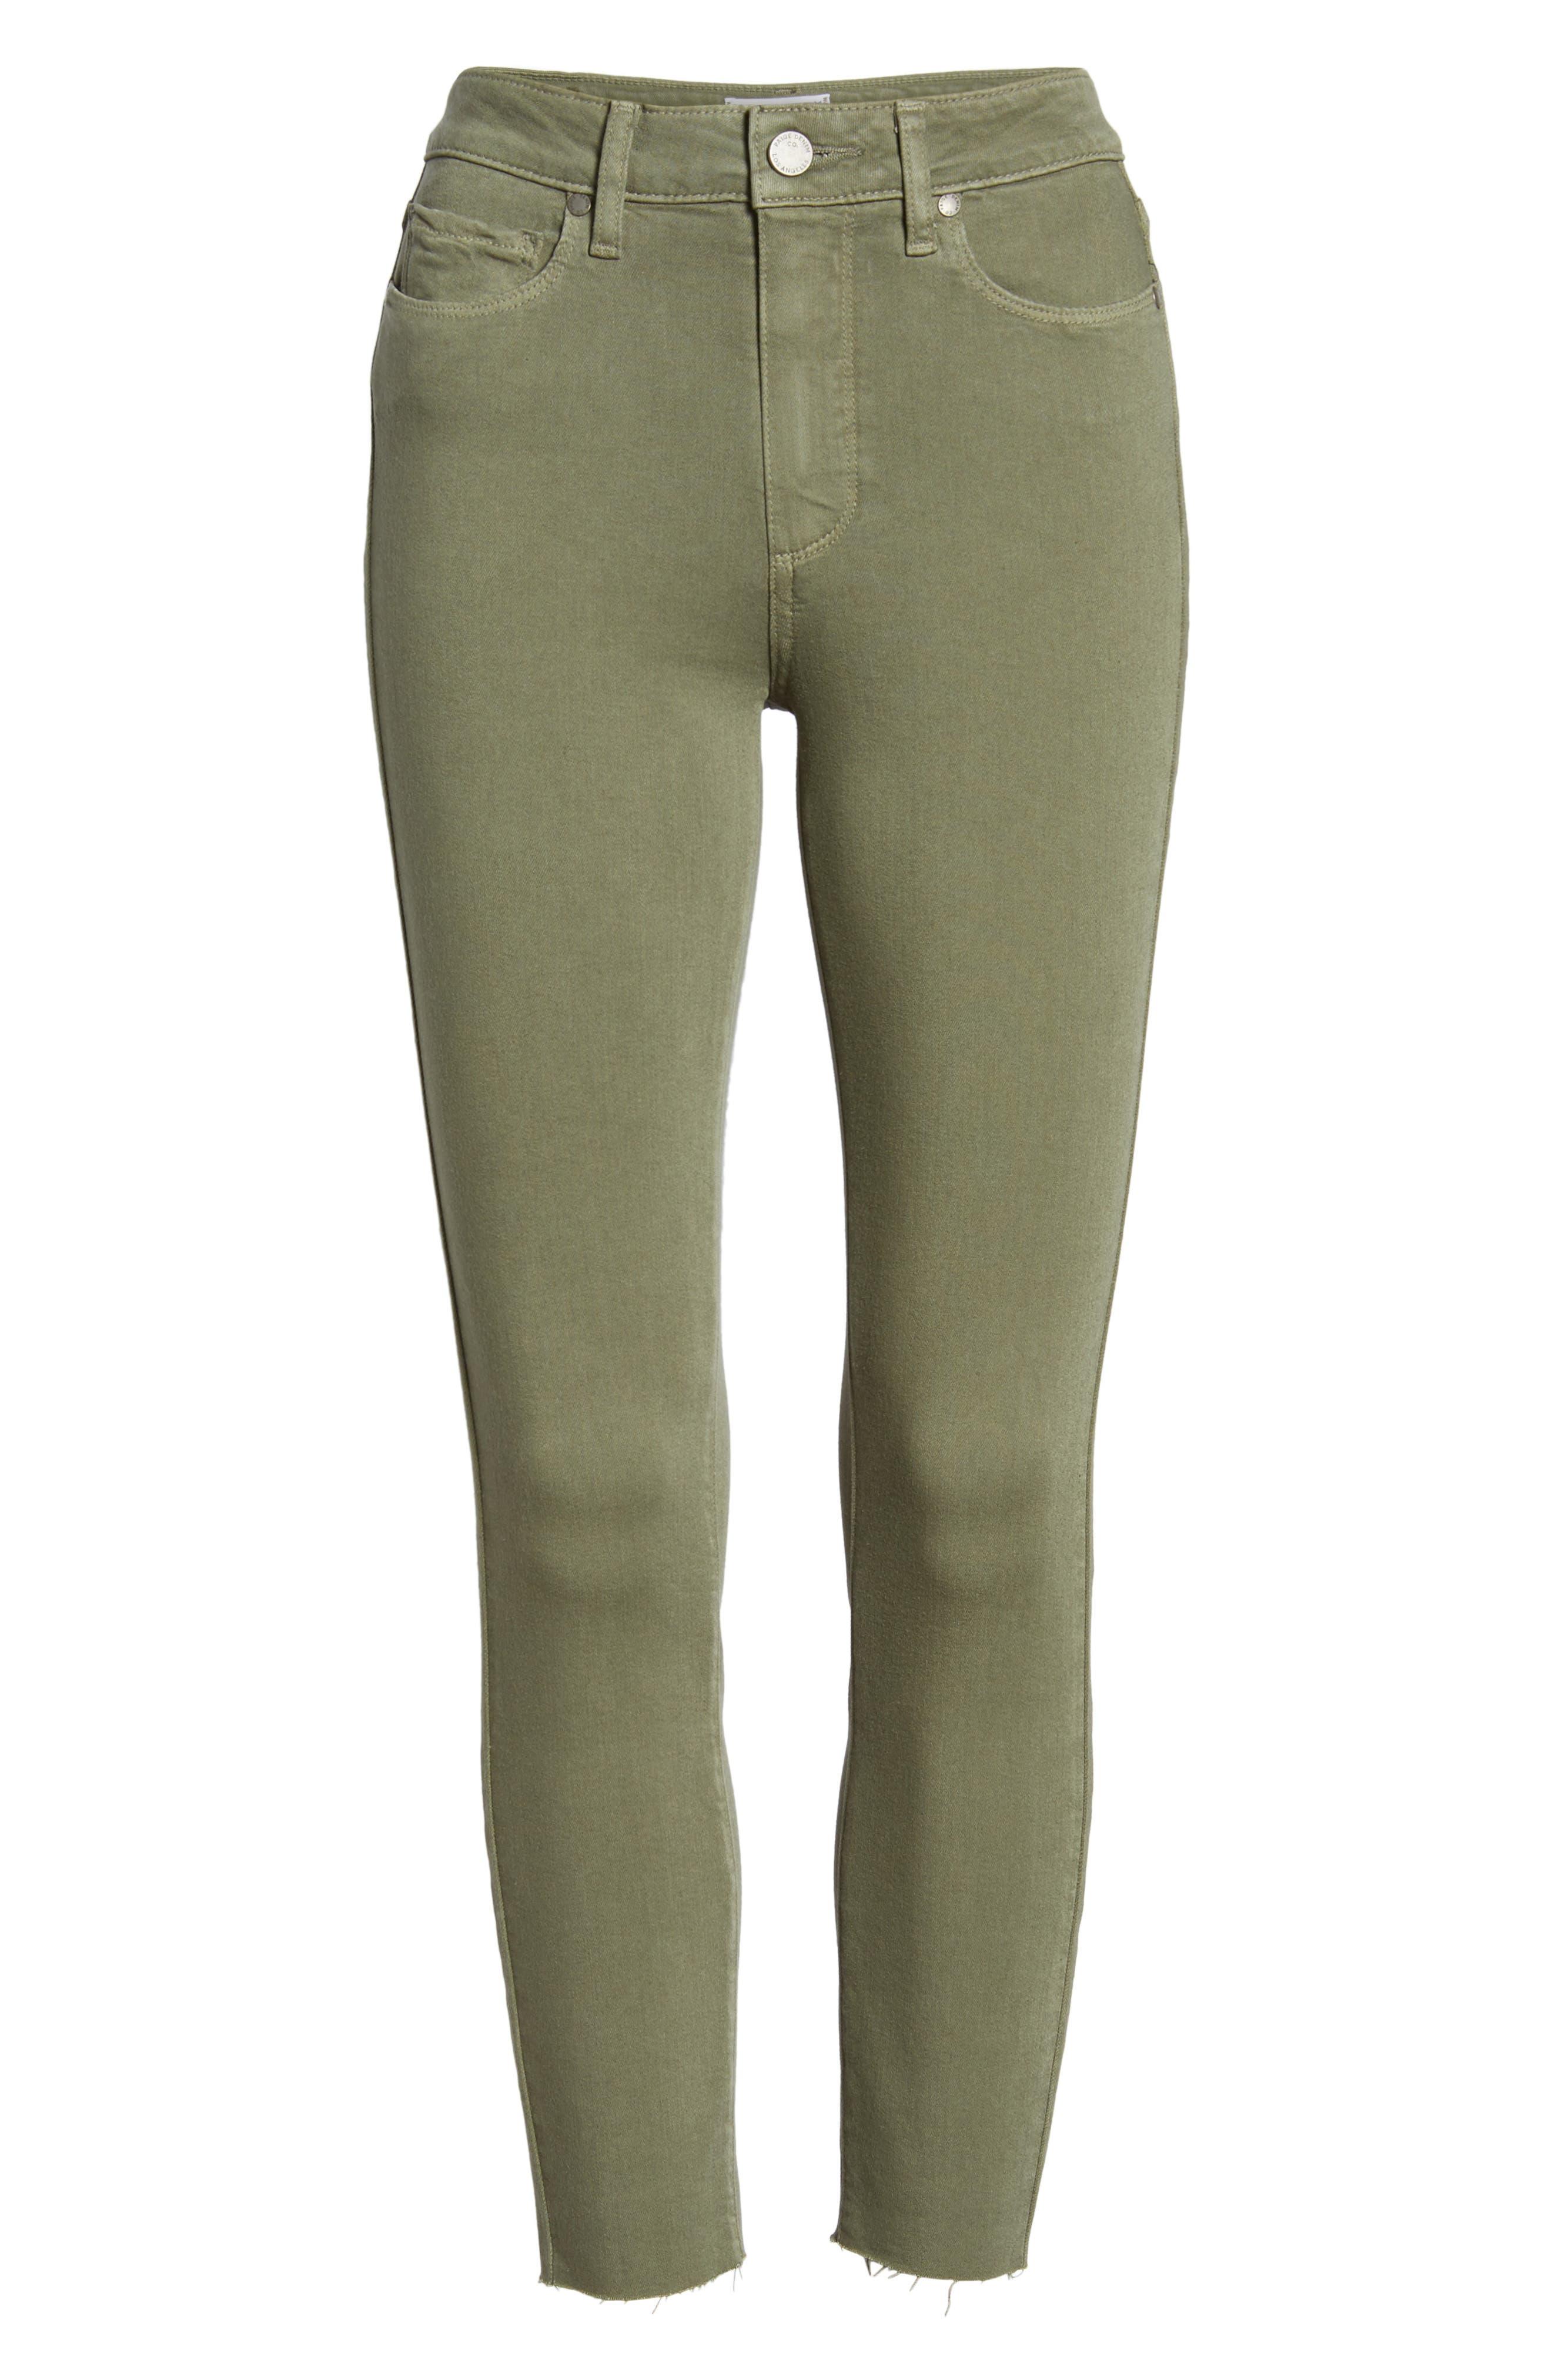 Hoxton High Waist Crop Skinny Jeans,                             Alternate thumbnail 7, color,                             Vintage Green